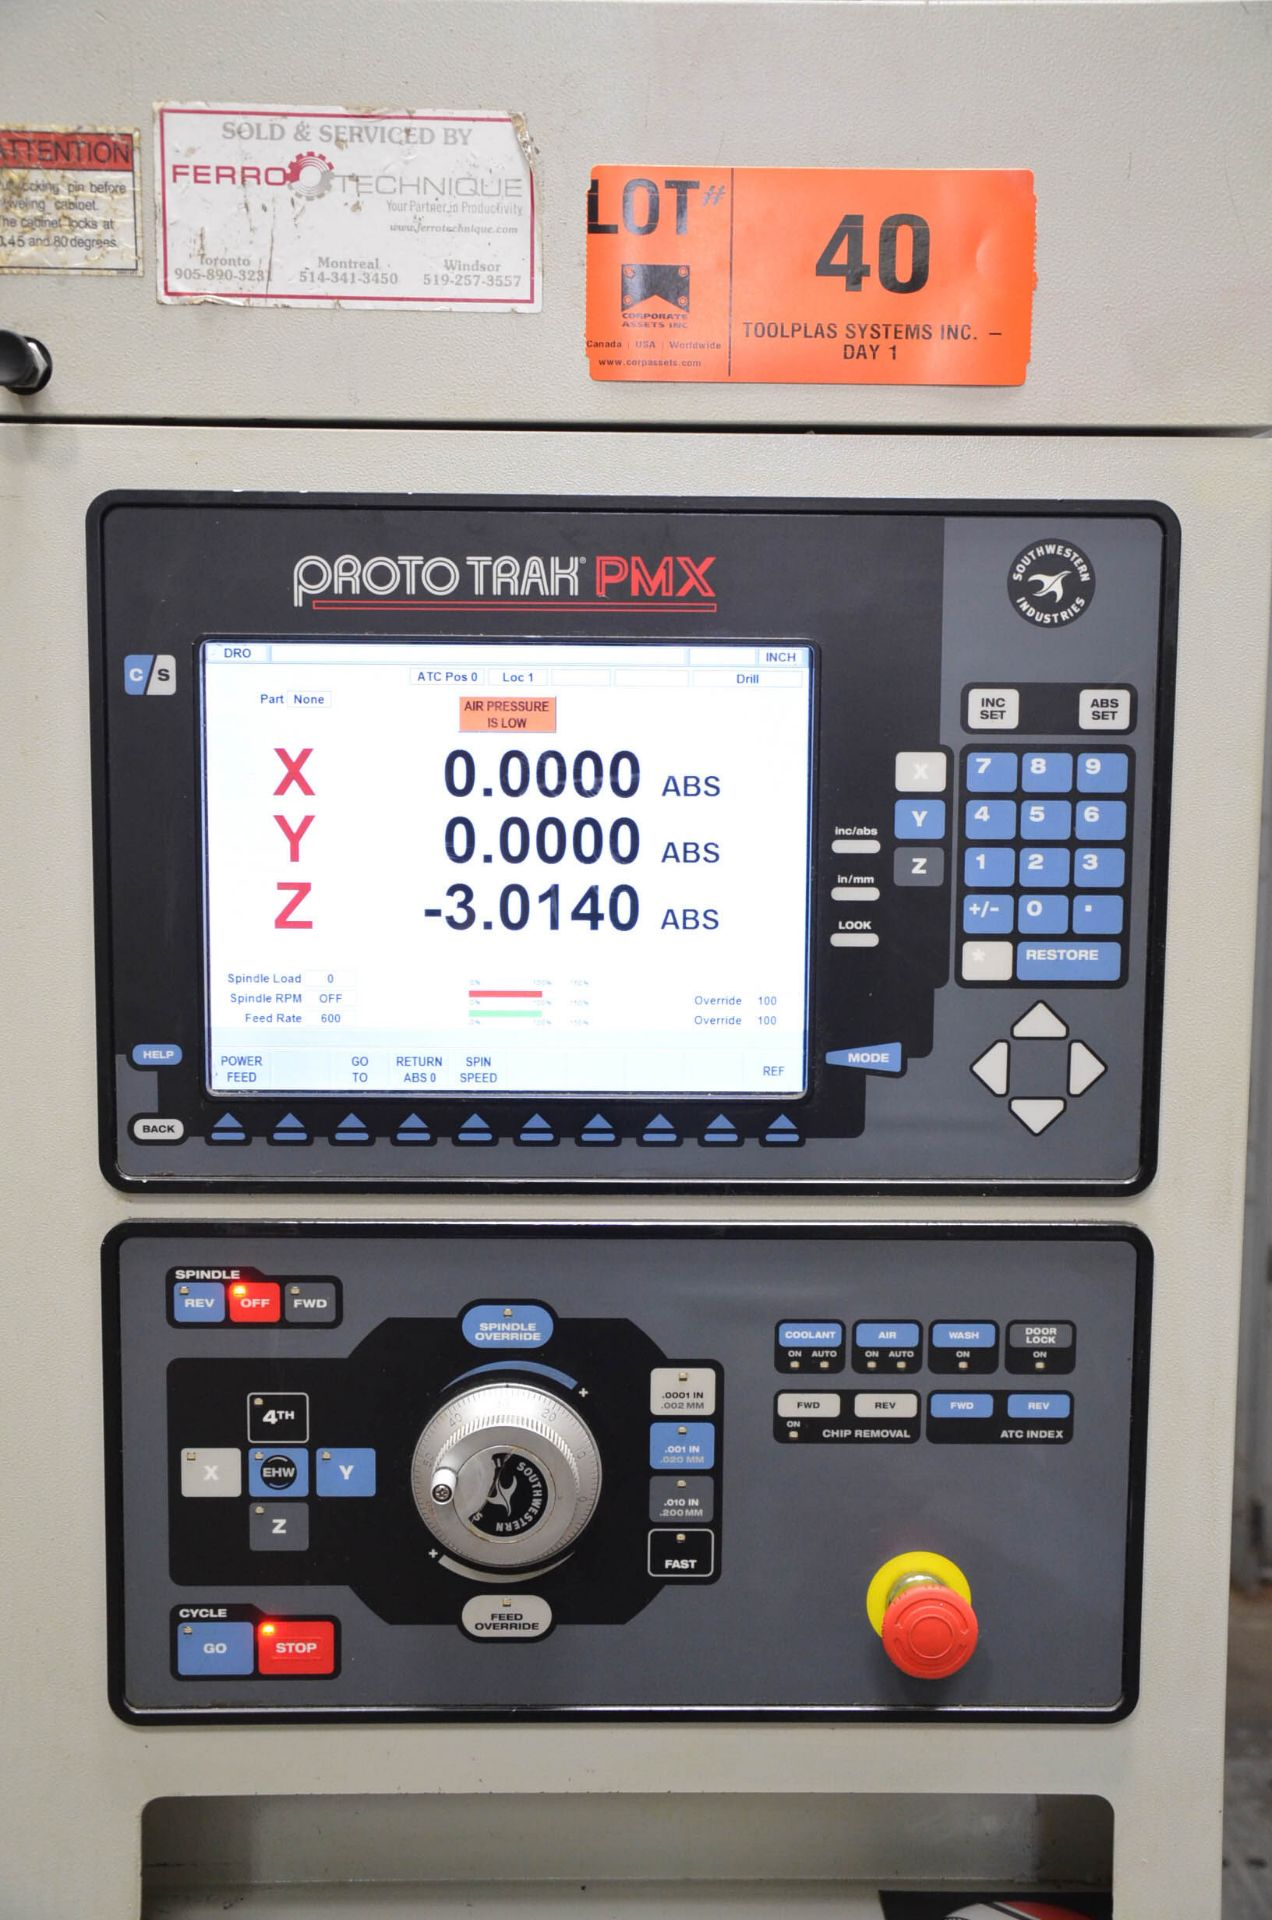 "SWI (2013) TRAK LPM CNC VERTICAL MACHINING CENTER WITH PROTO TRAK PMX CNC CONTROL, 19.5"" X 35.5"" - Image 9 of 9"